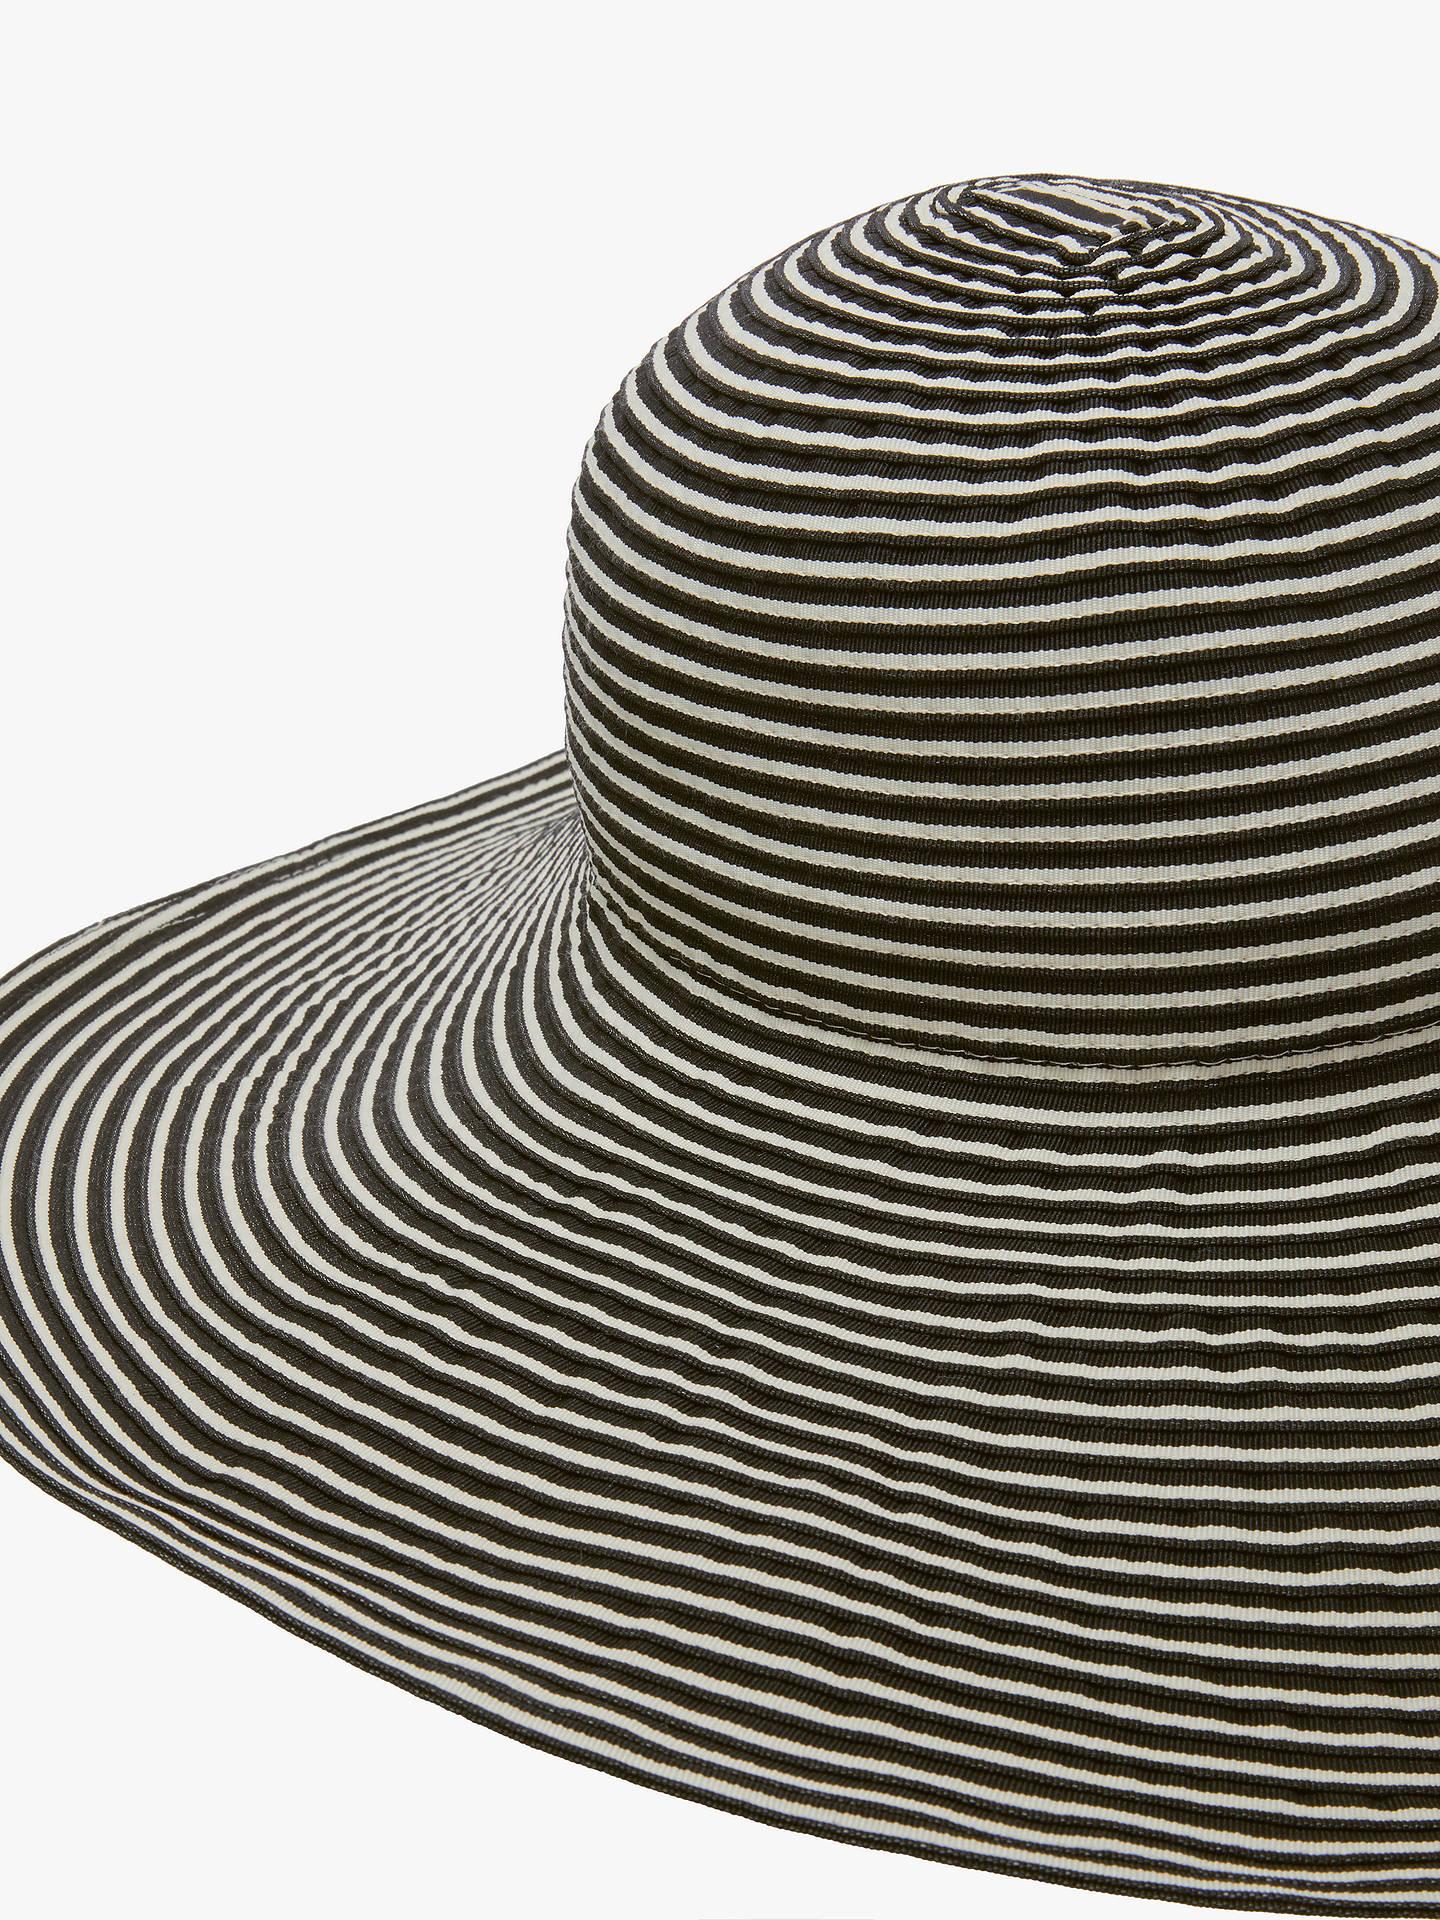 515f29e8 ... Buy John Lewis & Partners Packable Stripe Floppy Sun Hat, Black Mix  Online at johnlewis